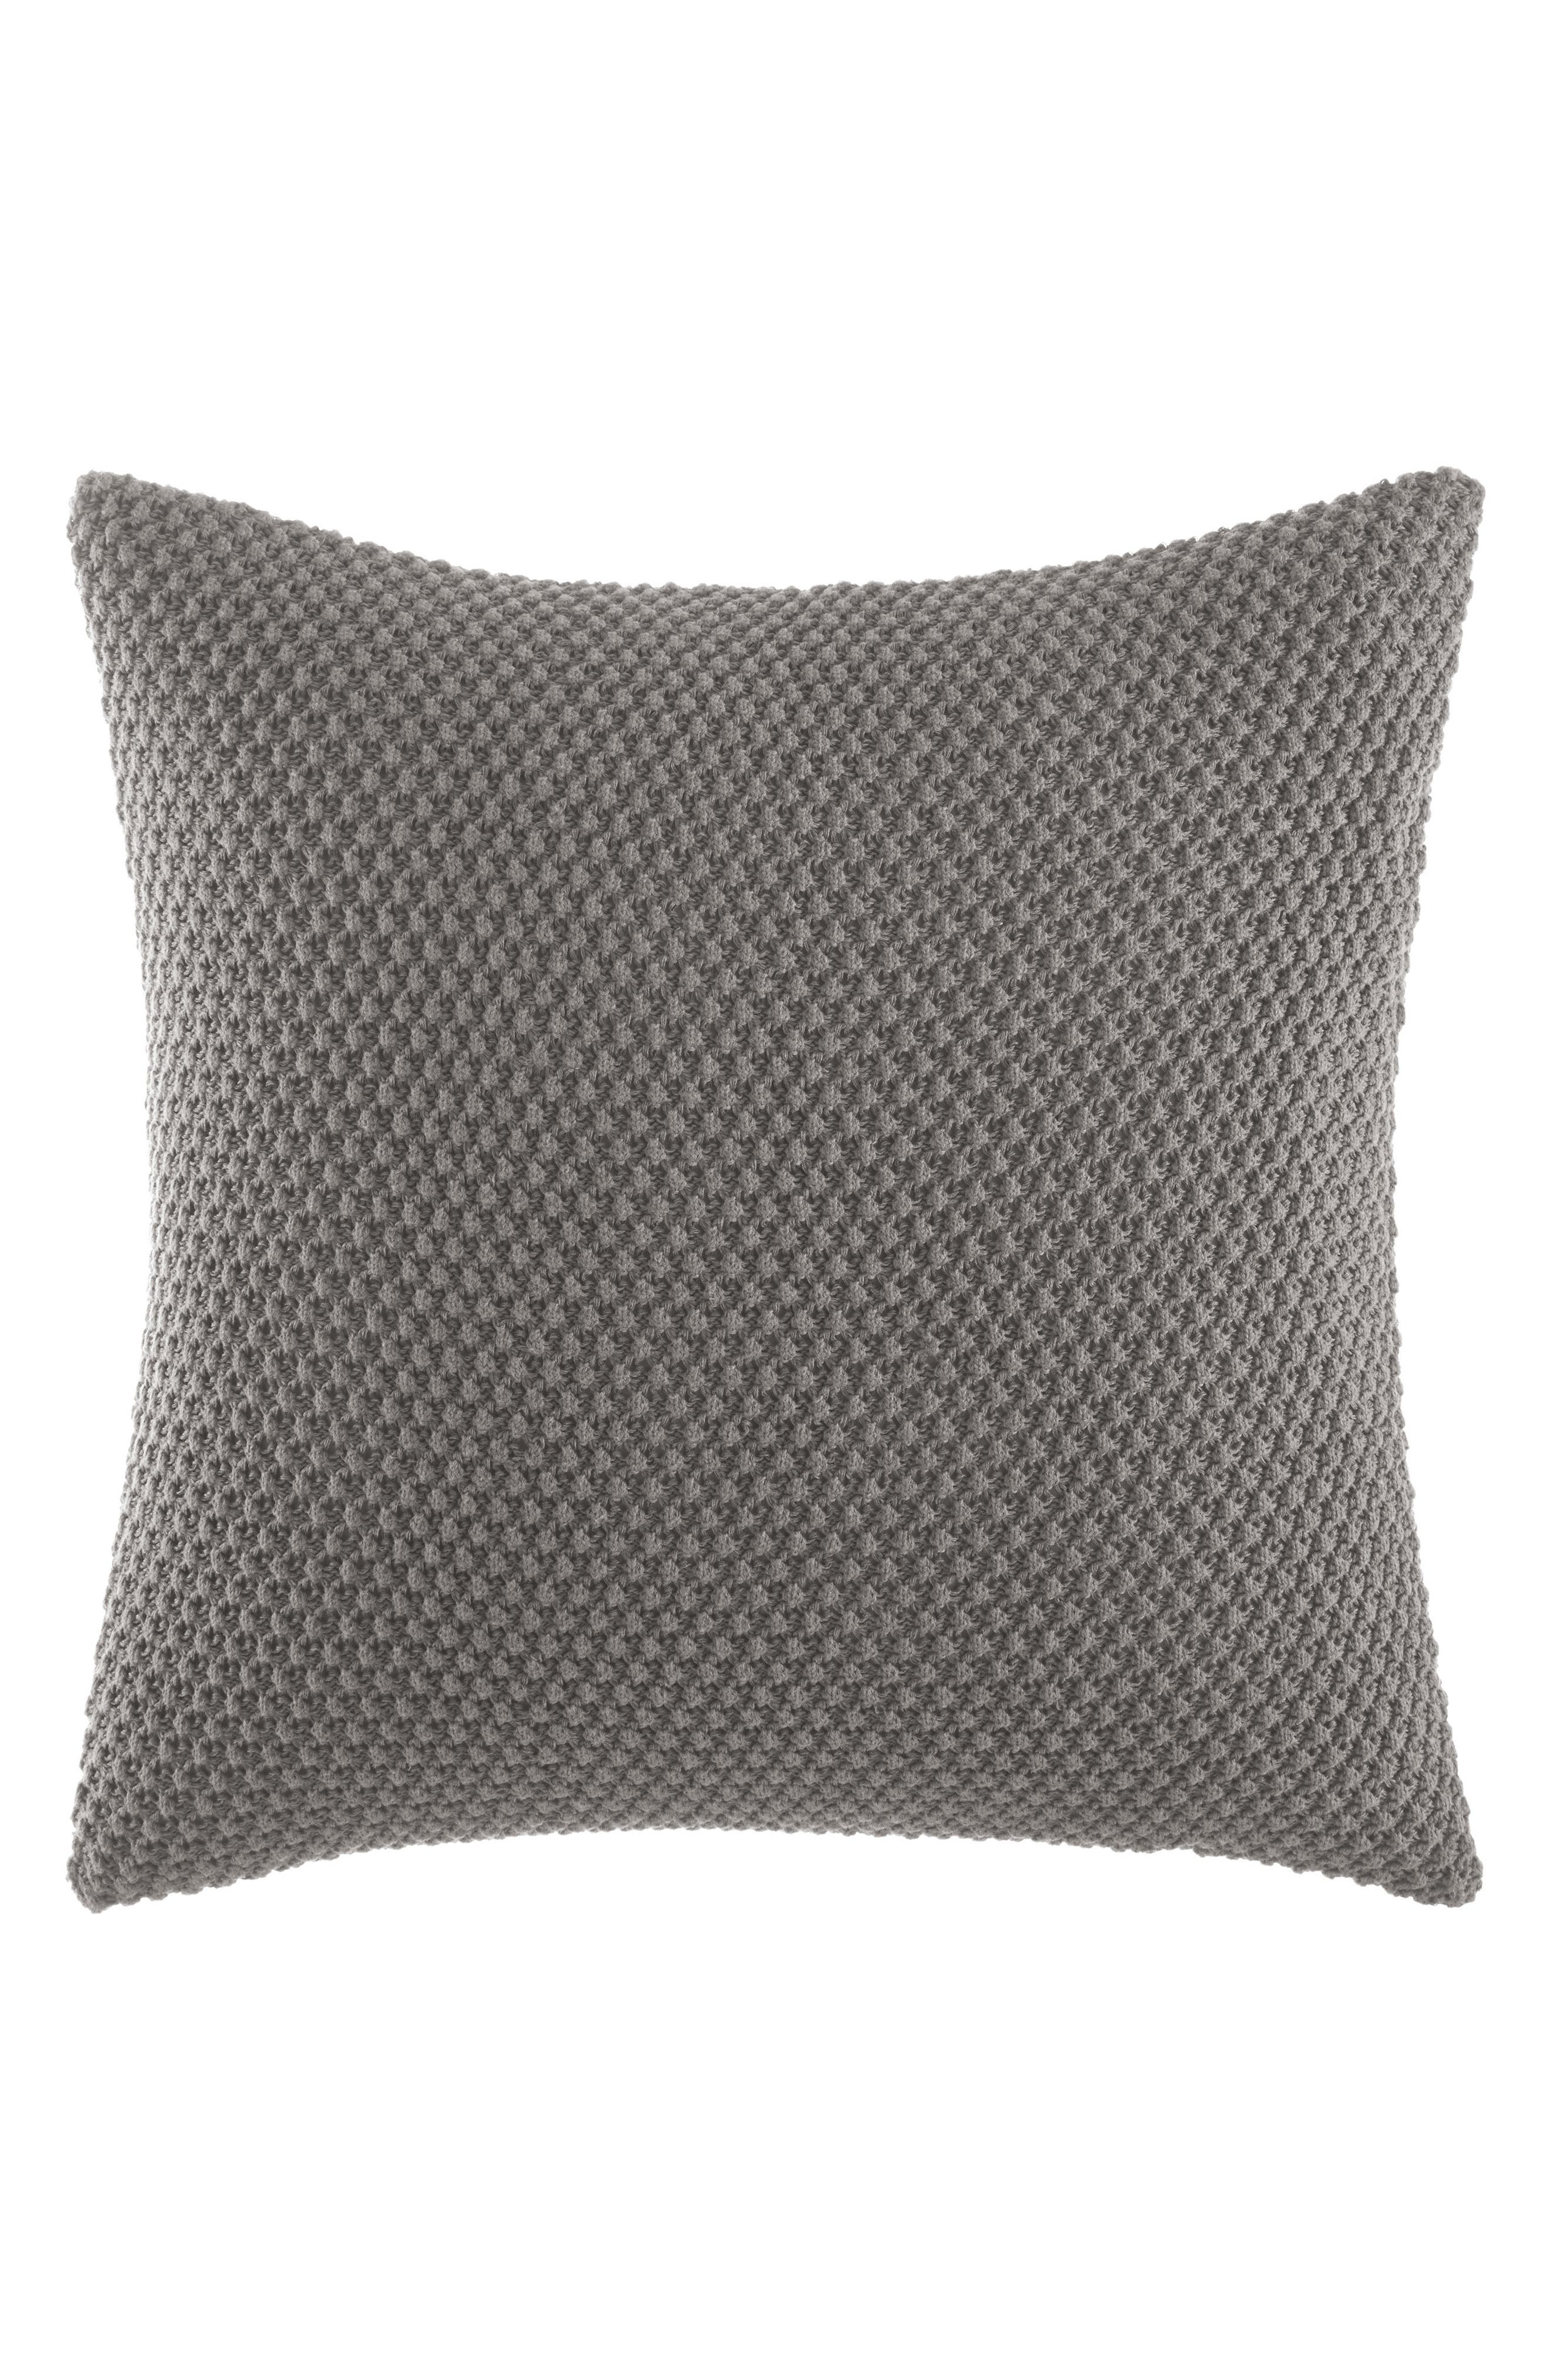 Transparent Leaves Knit Euro Sham,                         Main,                         color, Medium Gray